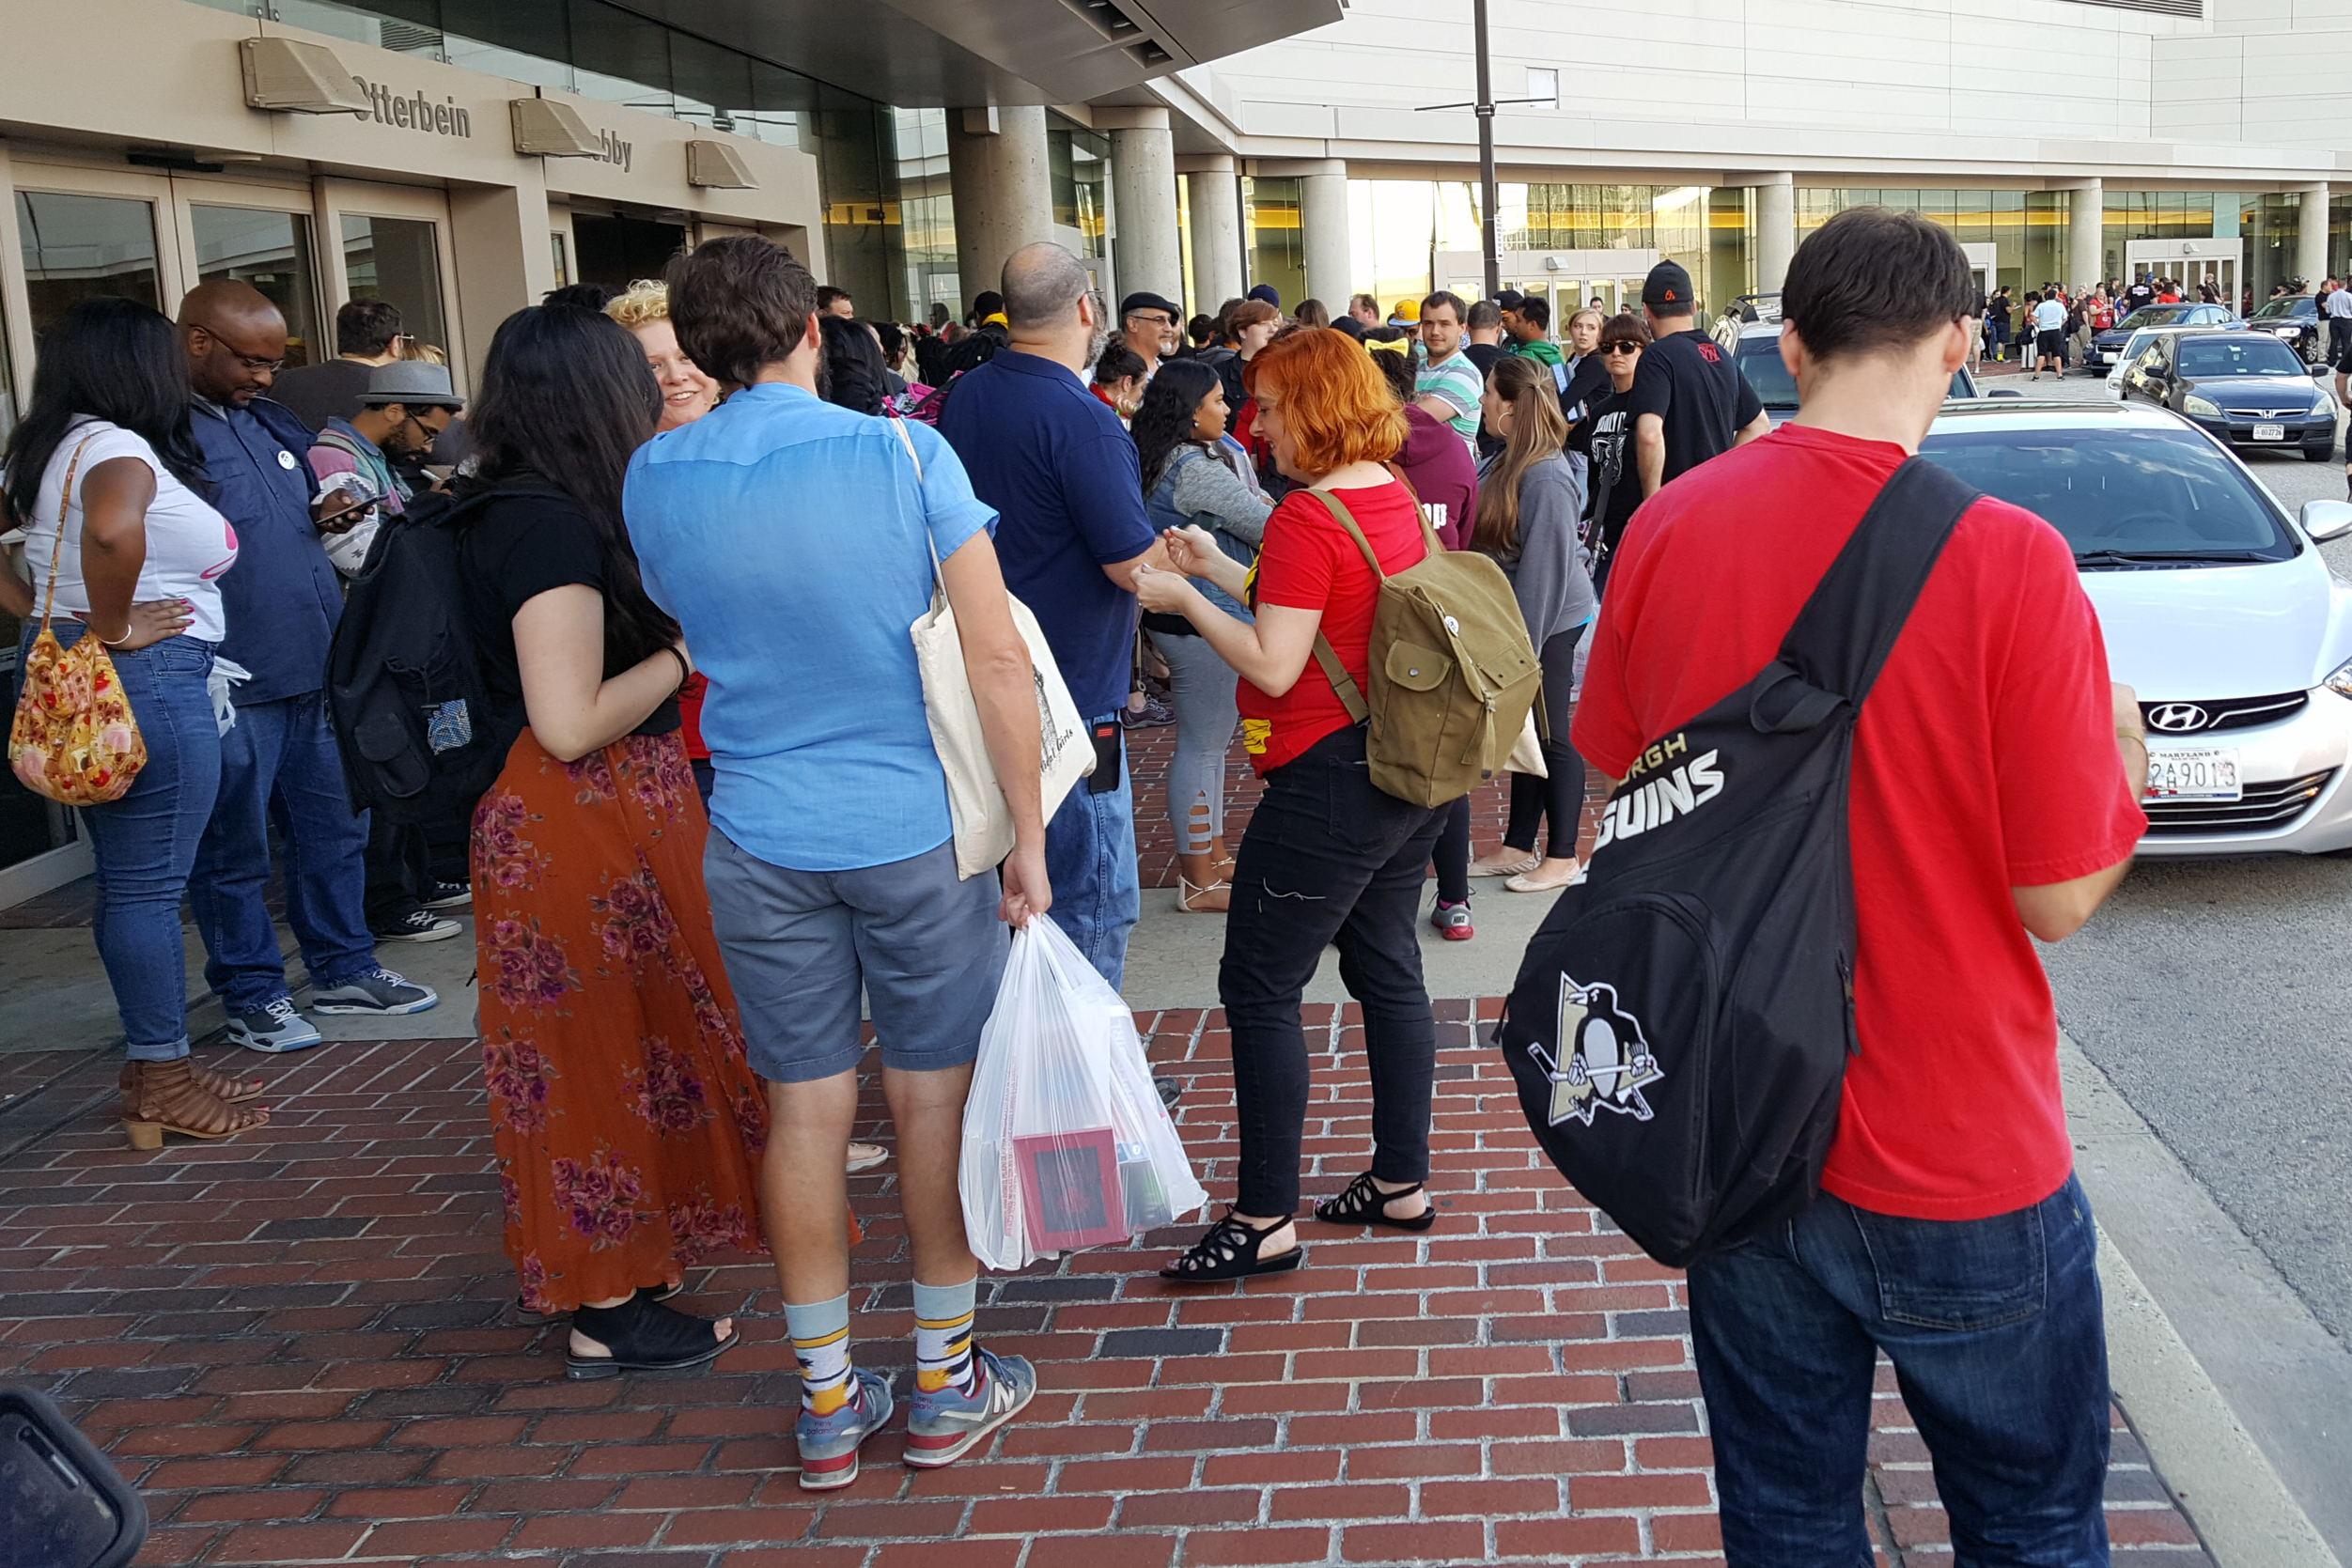 Baltimore Comic Con BCC Evacuation